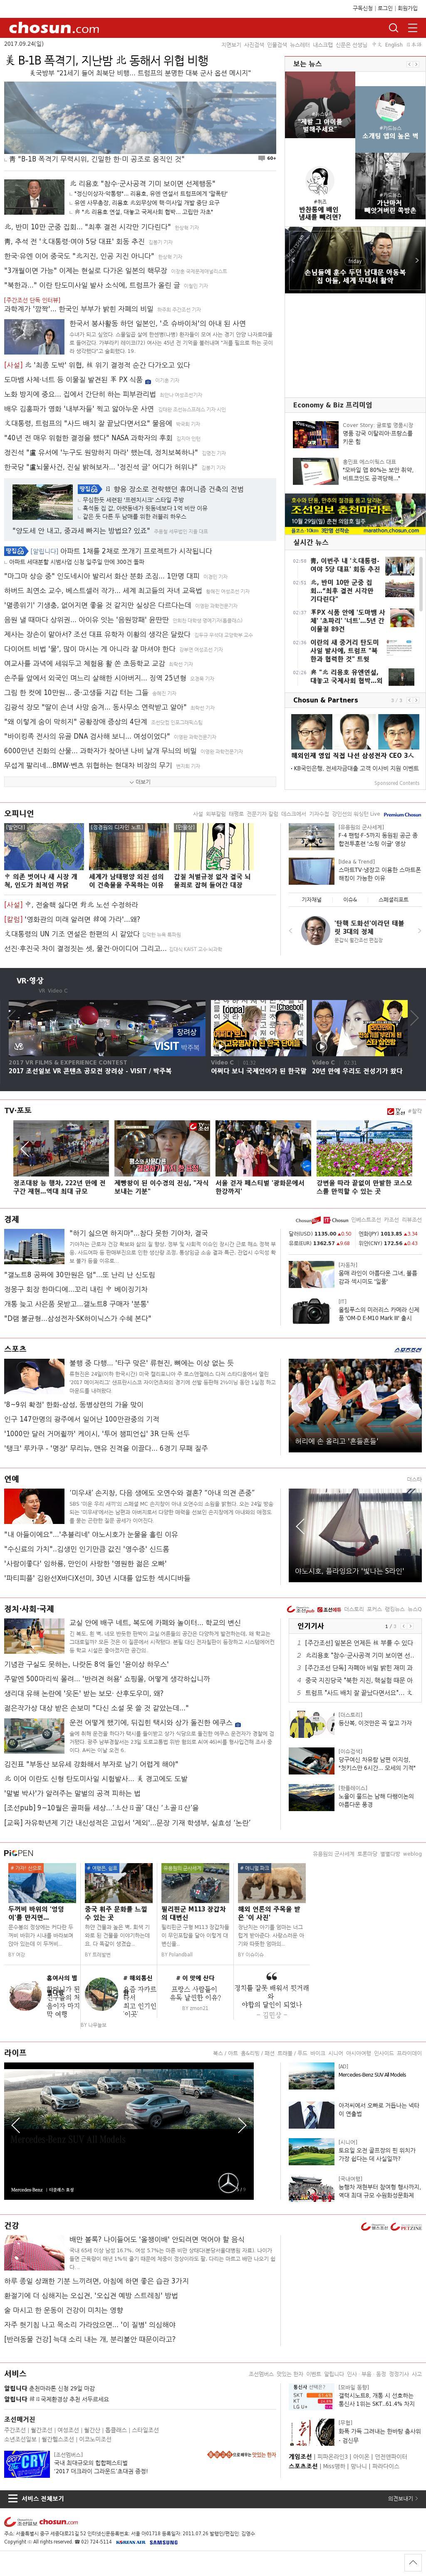 chosun.com at Sunday Sept. 24, 2017, 3:11 a.m. UTC